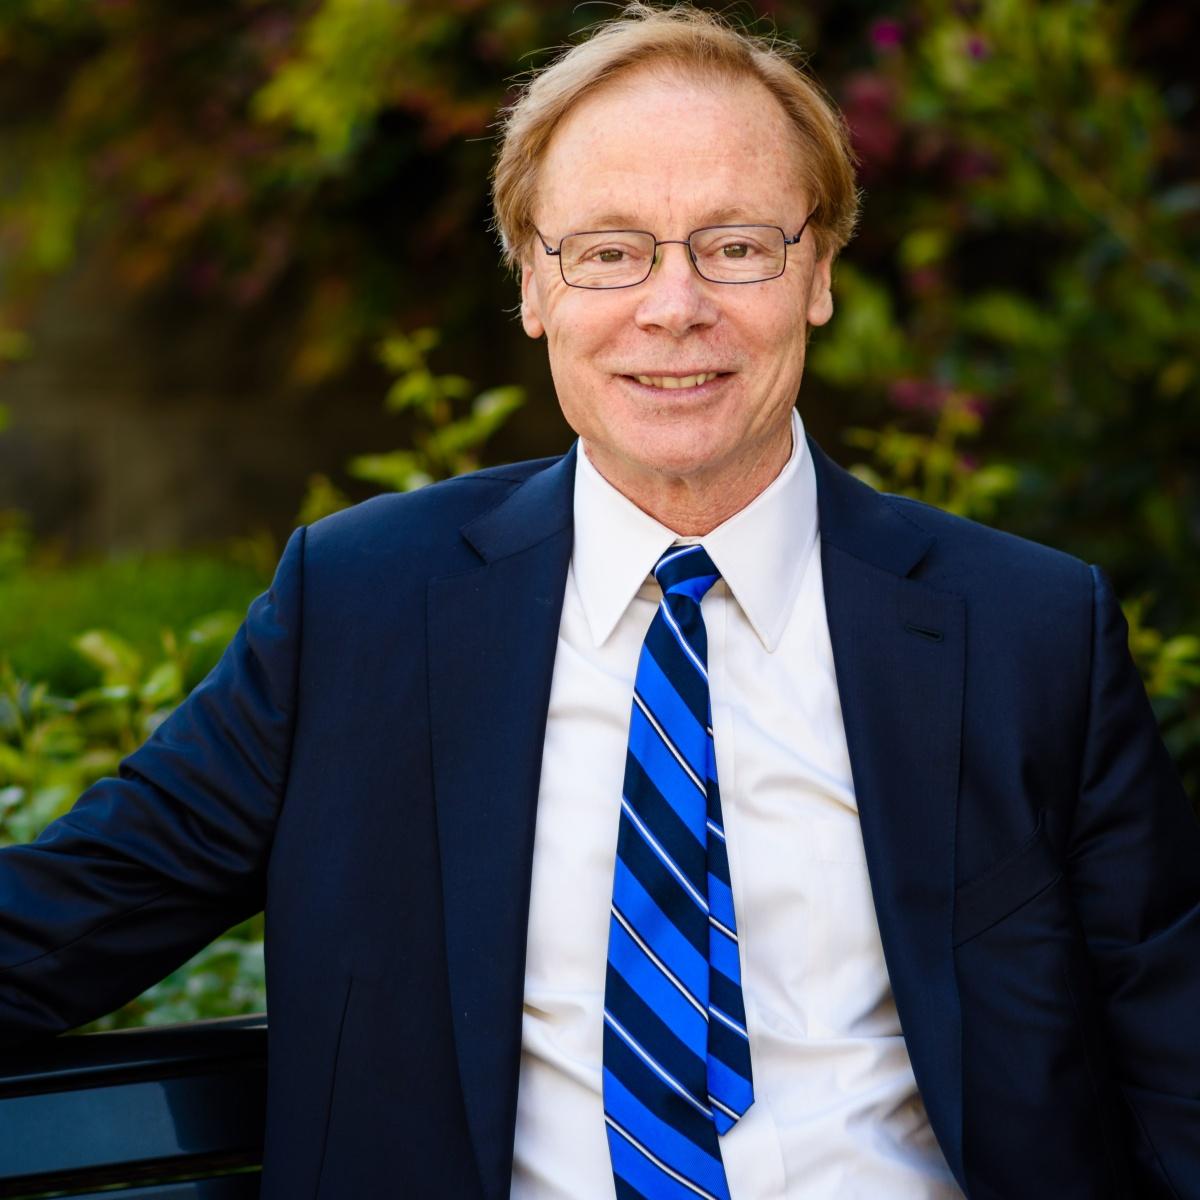 Charles M. Riffle